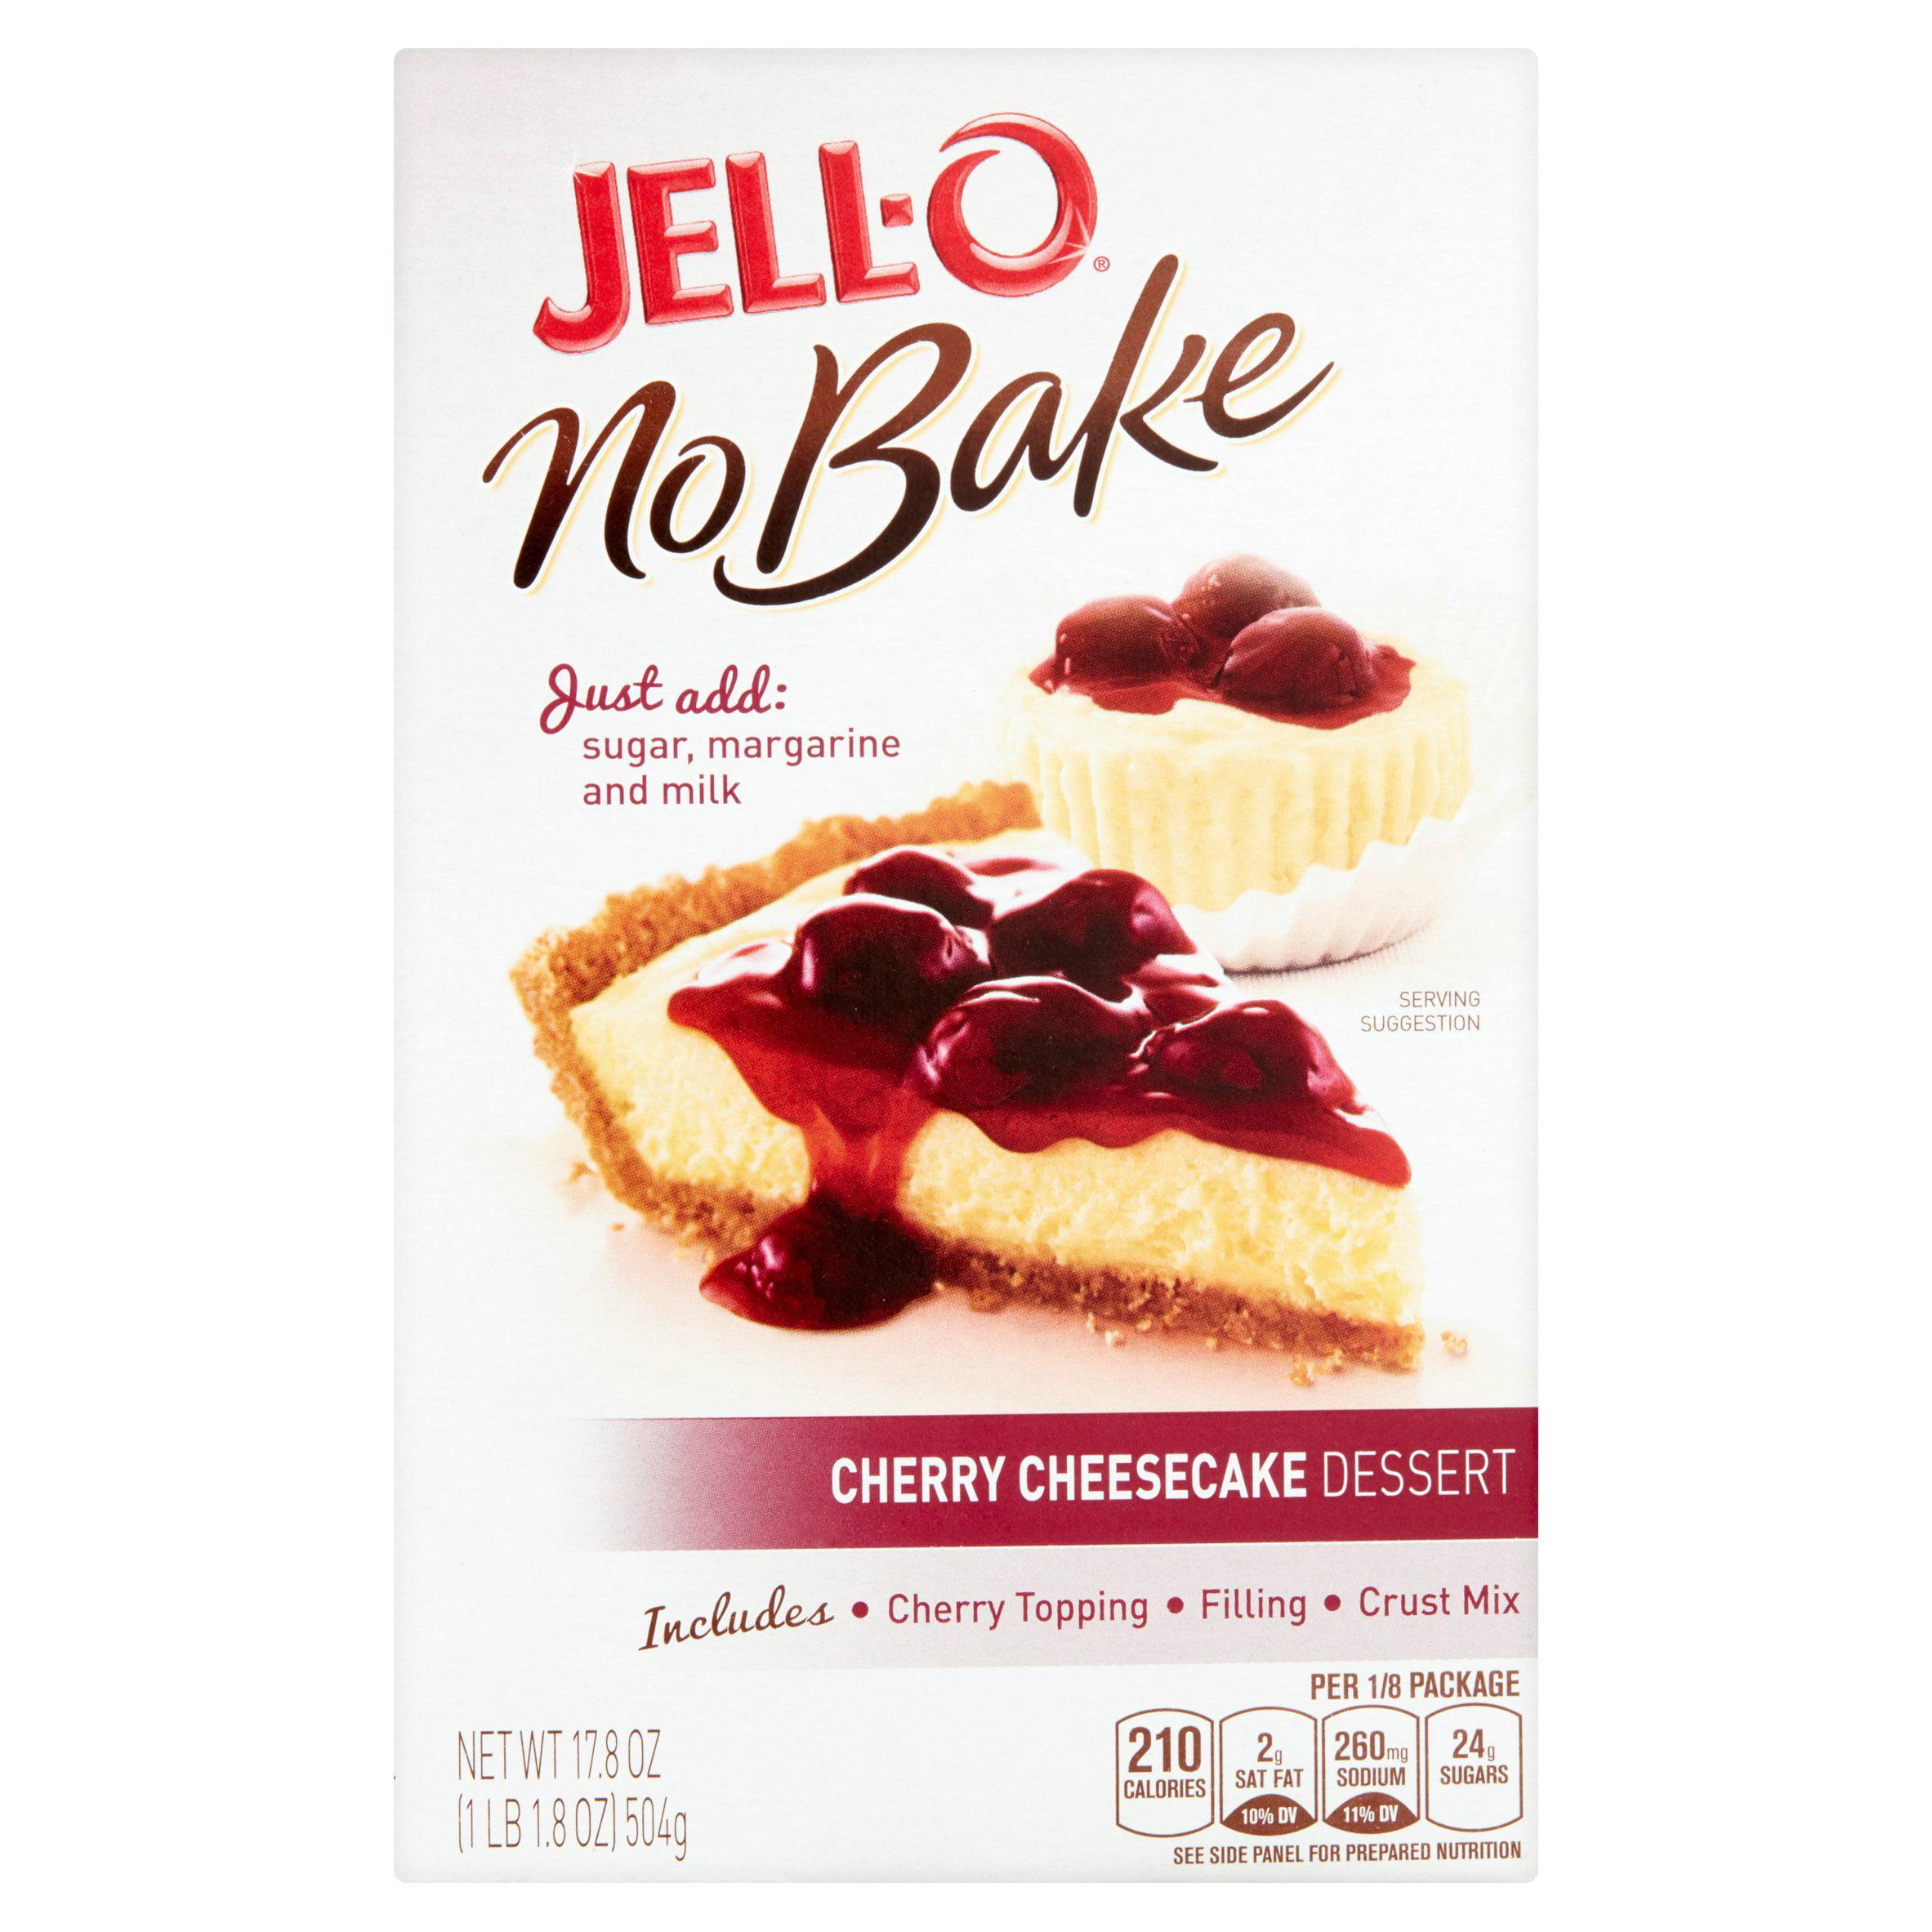 Jell-O No Bake Cherry Cheesecake Dessert Kit, 17.8 Oz by Generic